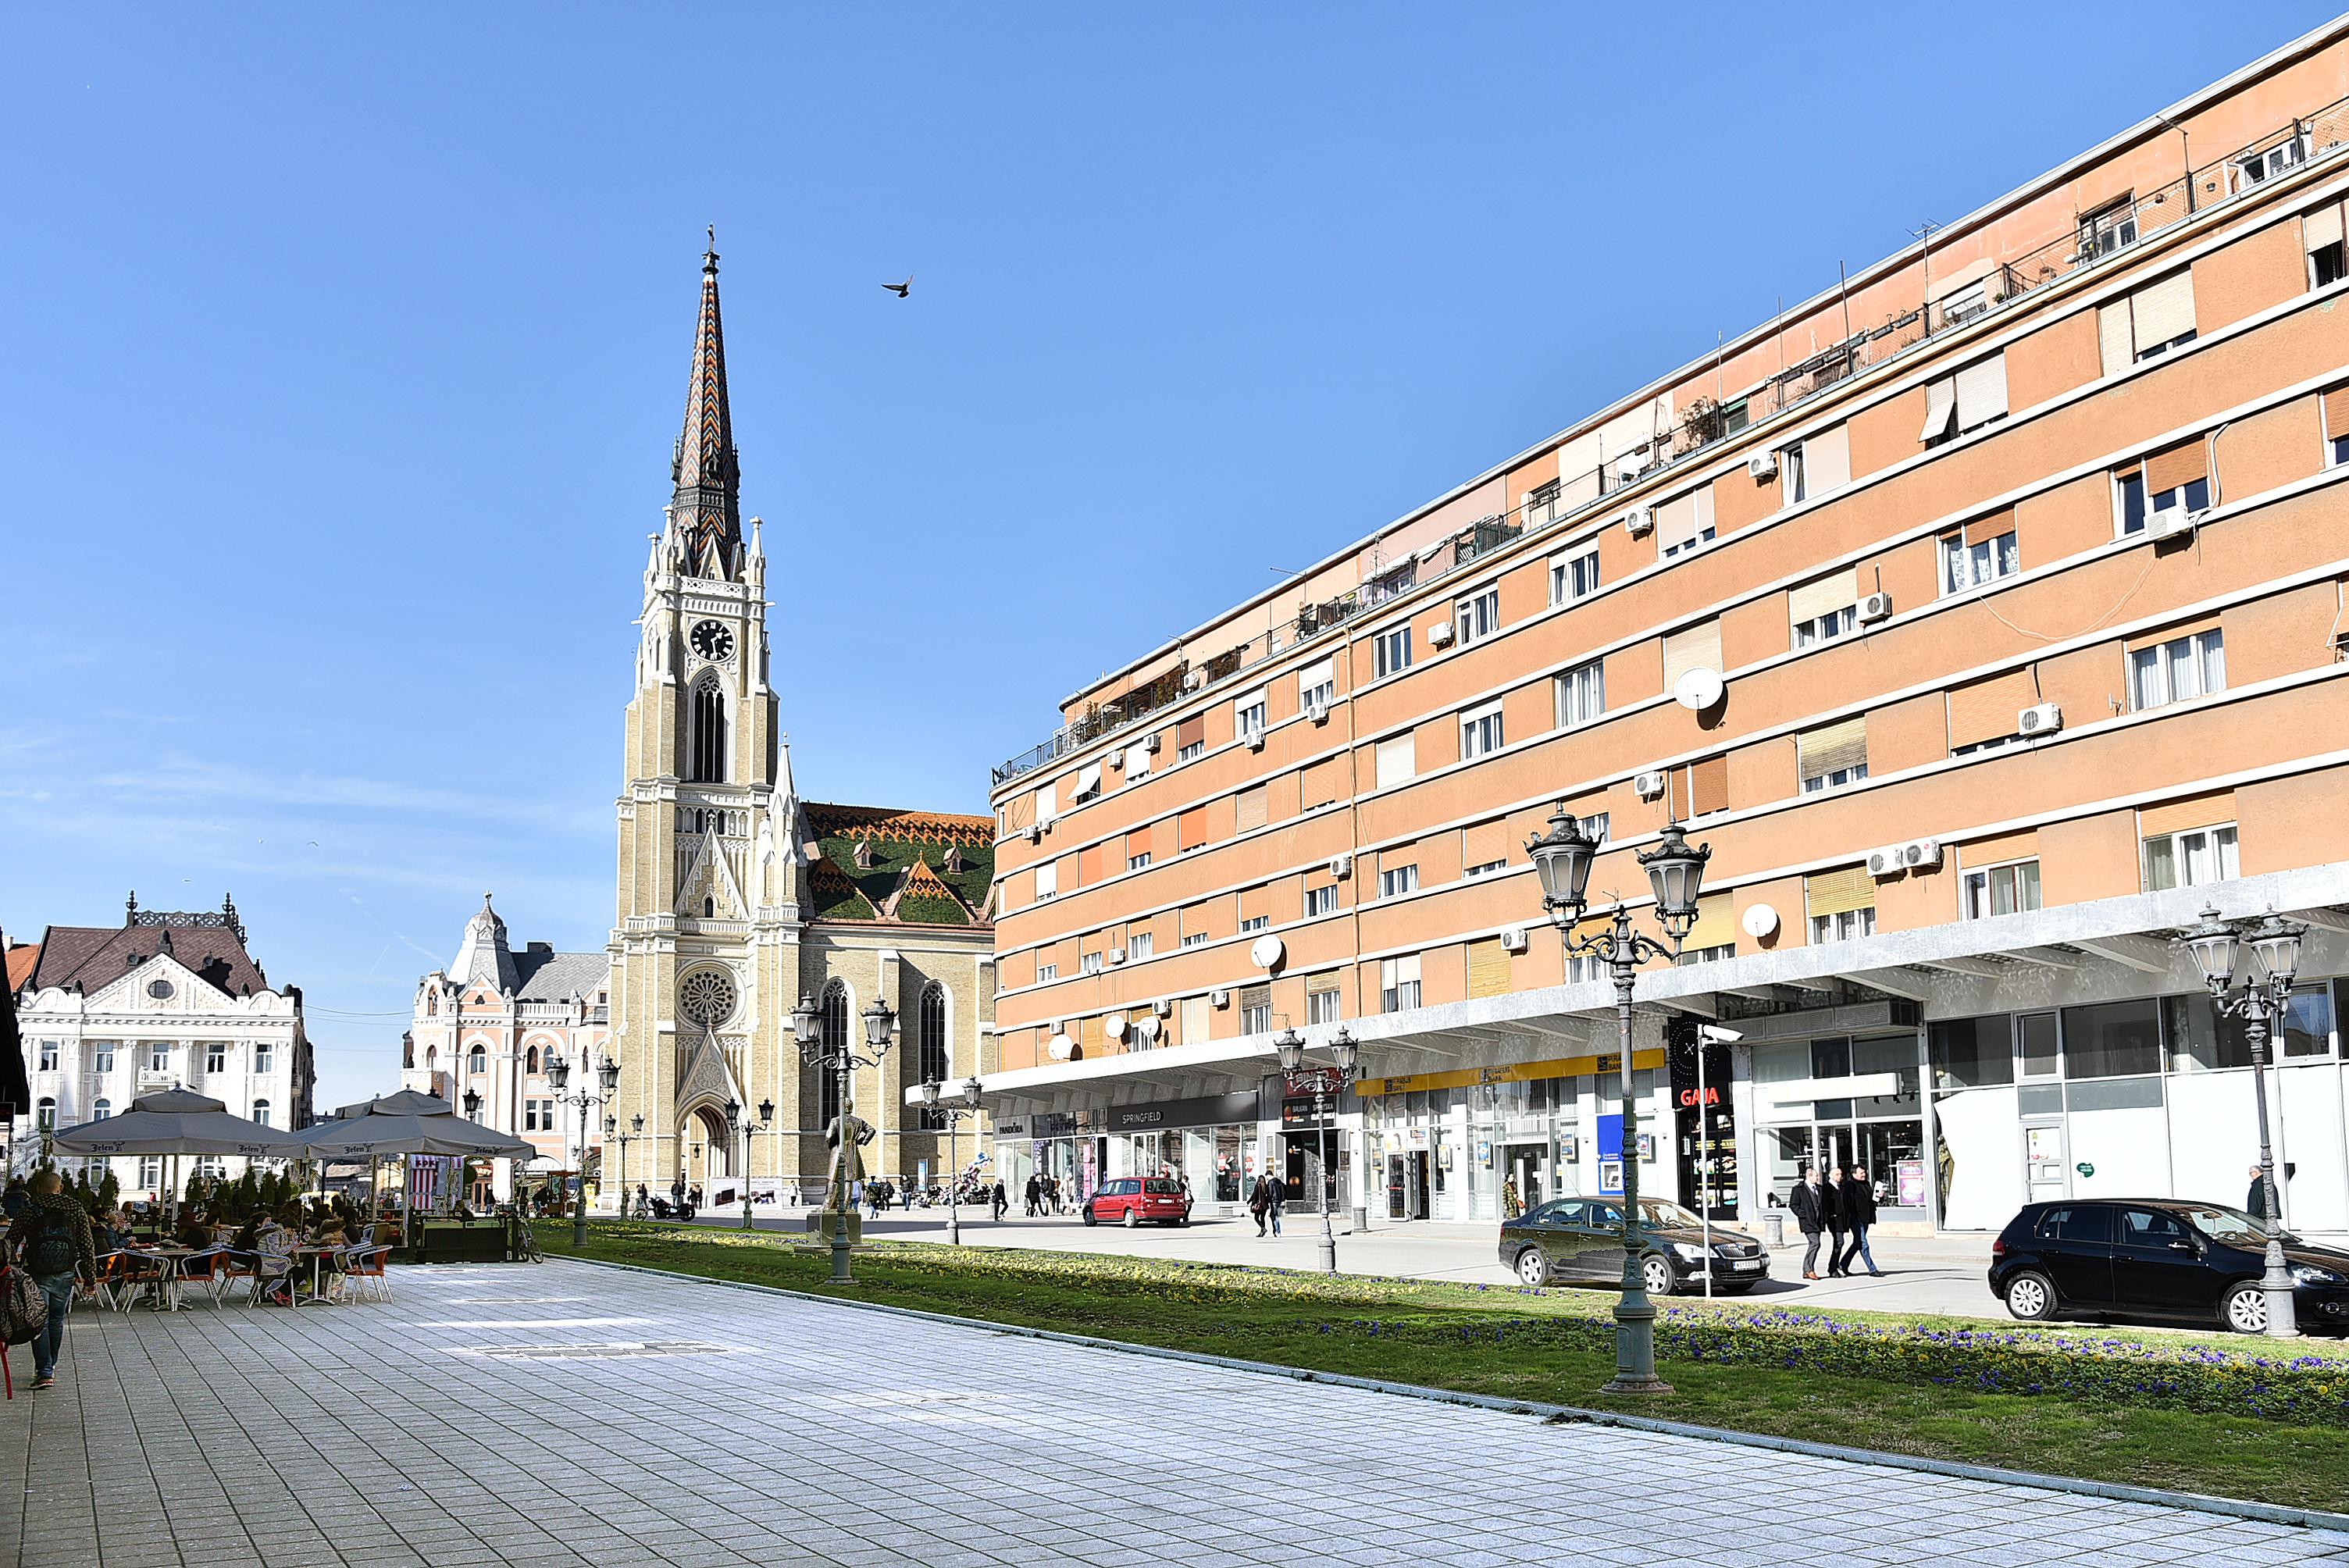 centar Katedrala iz Modene2 Mladen Sekulic